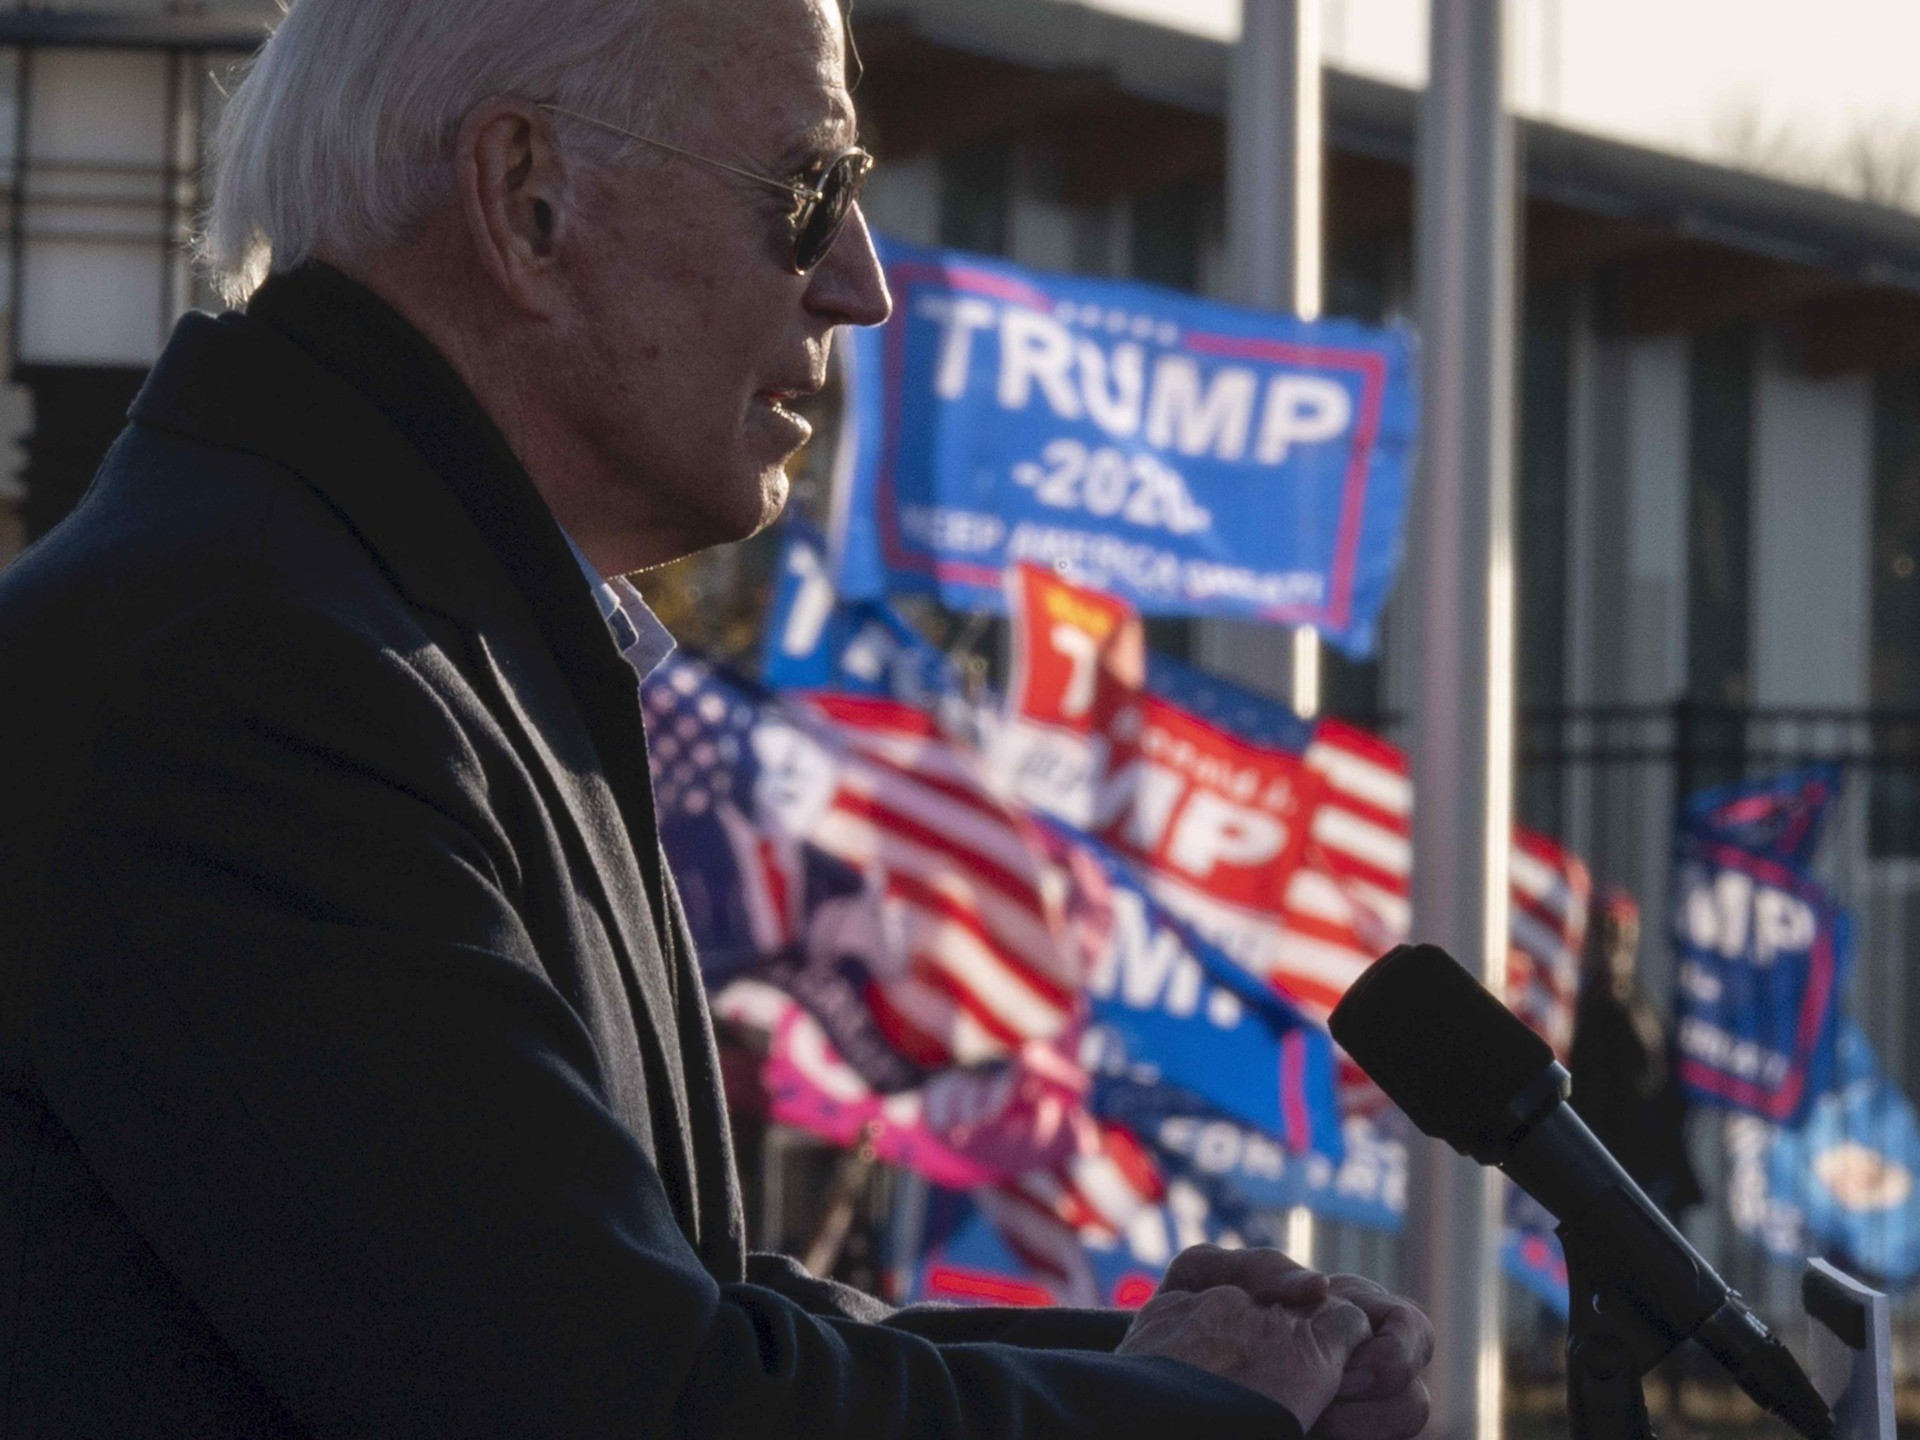 WATCH: Joe Biden Melts Down at Trump Supporters in Minnesota: 'Ugly People'